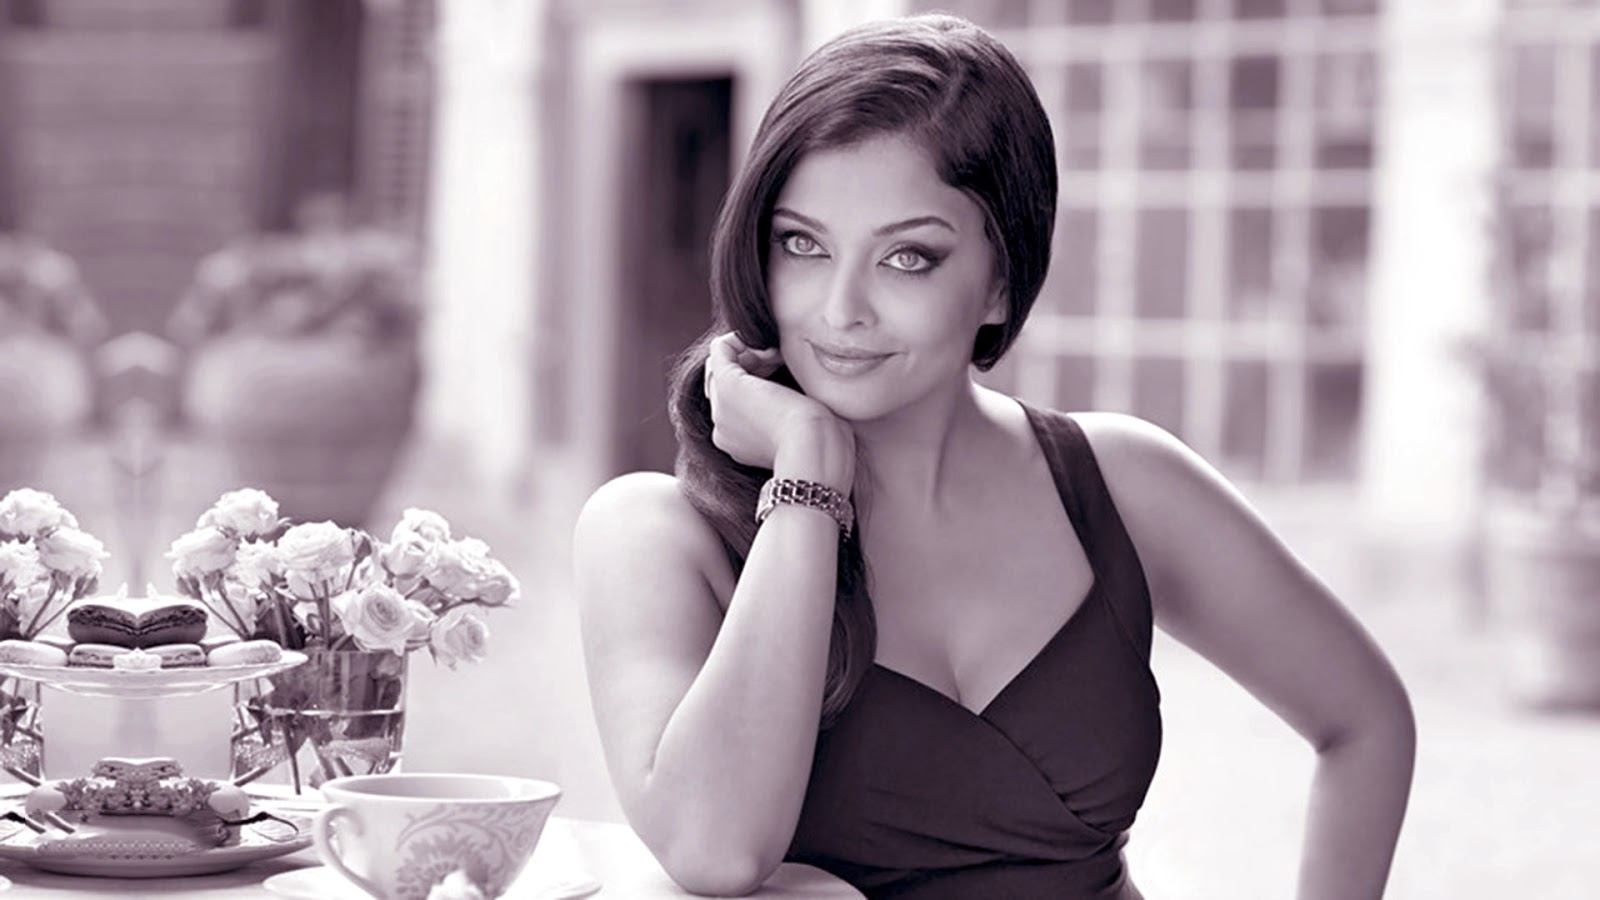 Aishwarya Rai Bachchan Wallpapers Hd Download Free 1080P